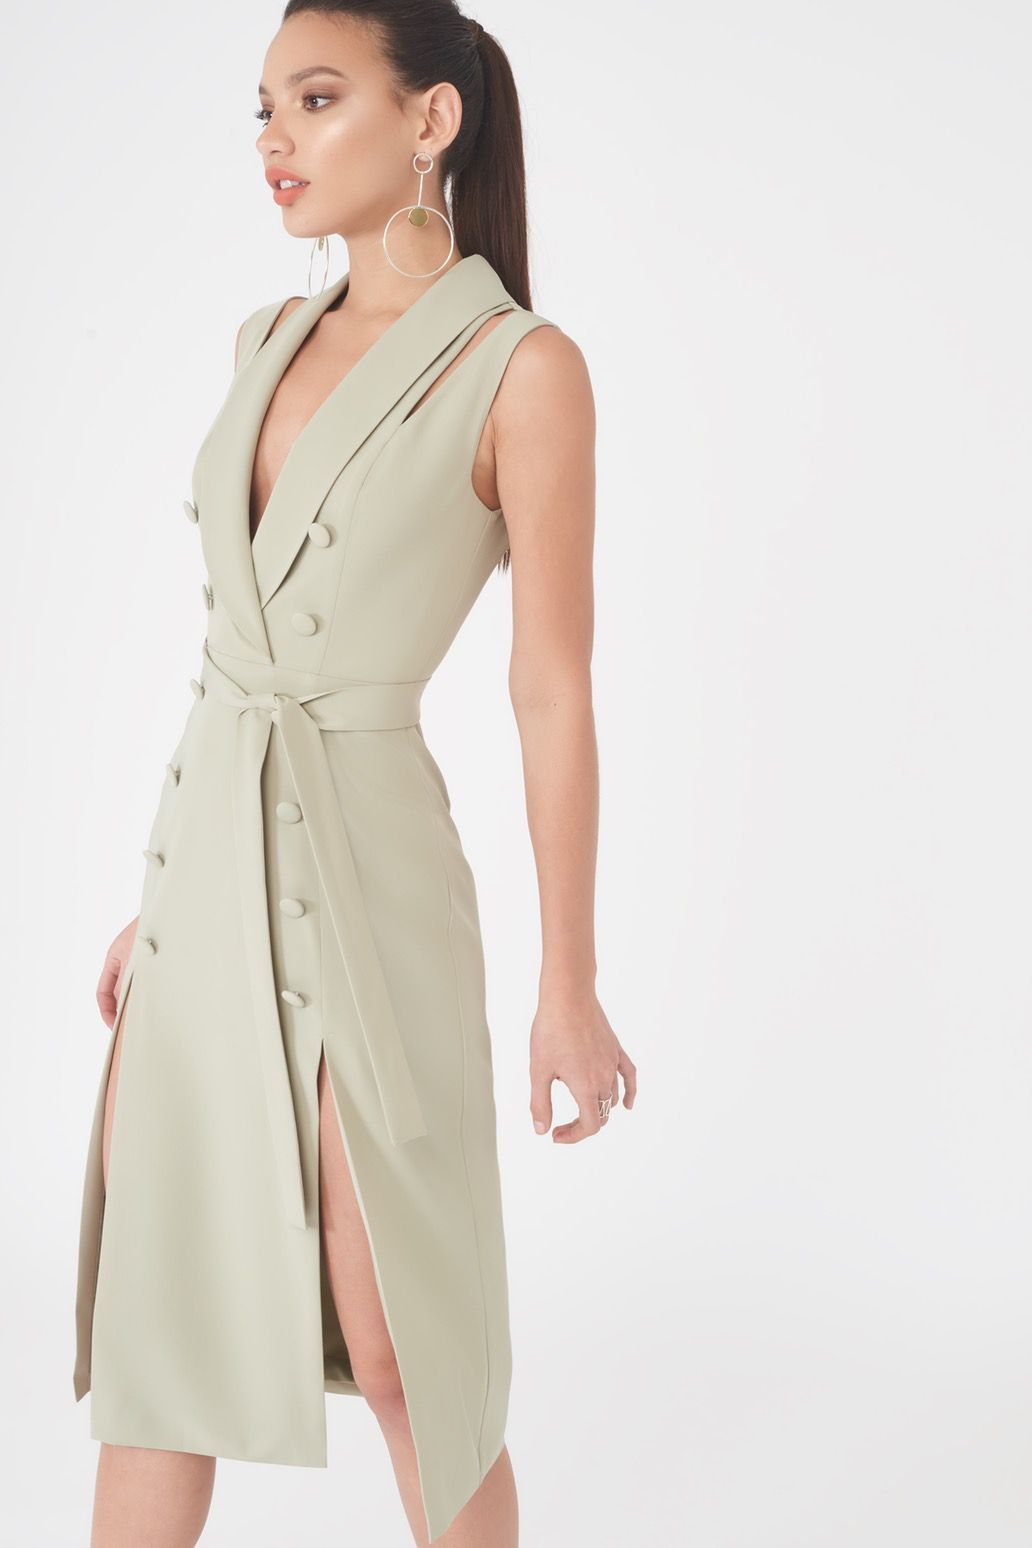 Image of Sleeveless Tuxedo Midi Dress with Double Split Skirt in Sage Green